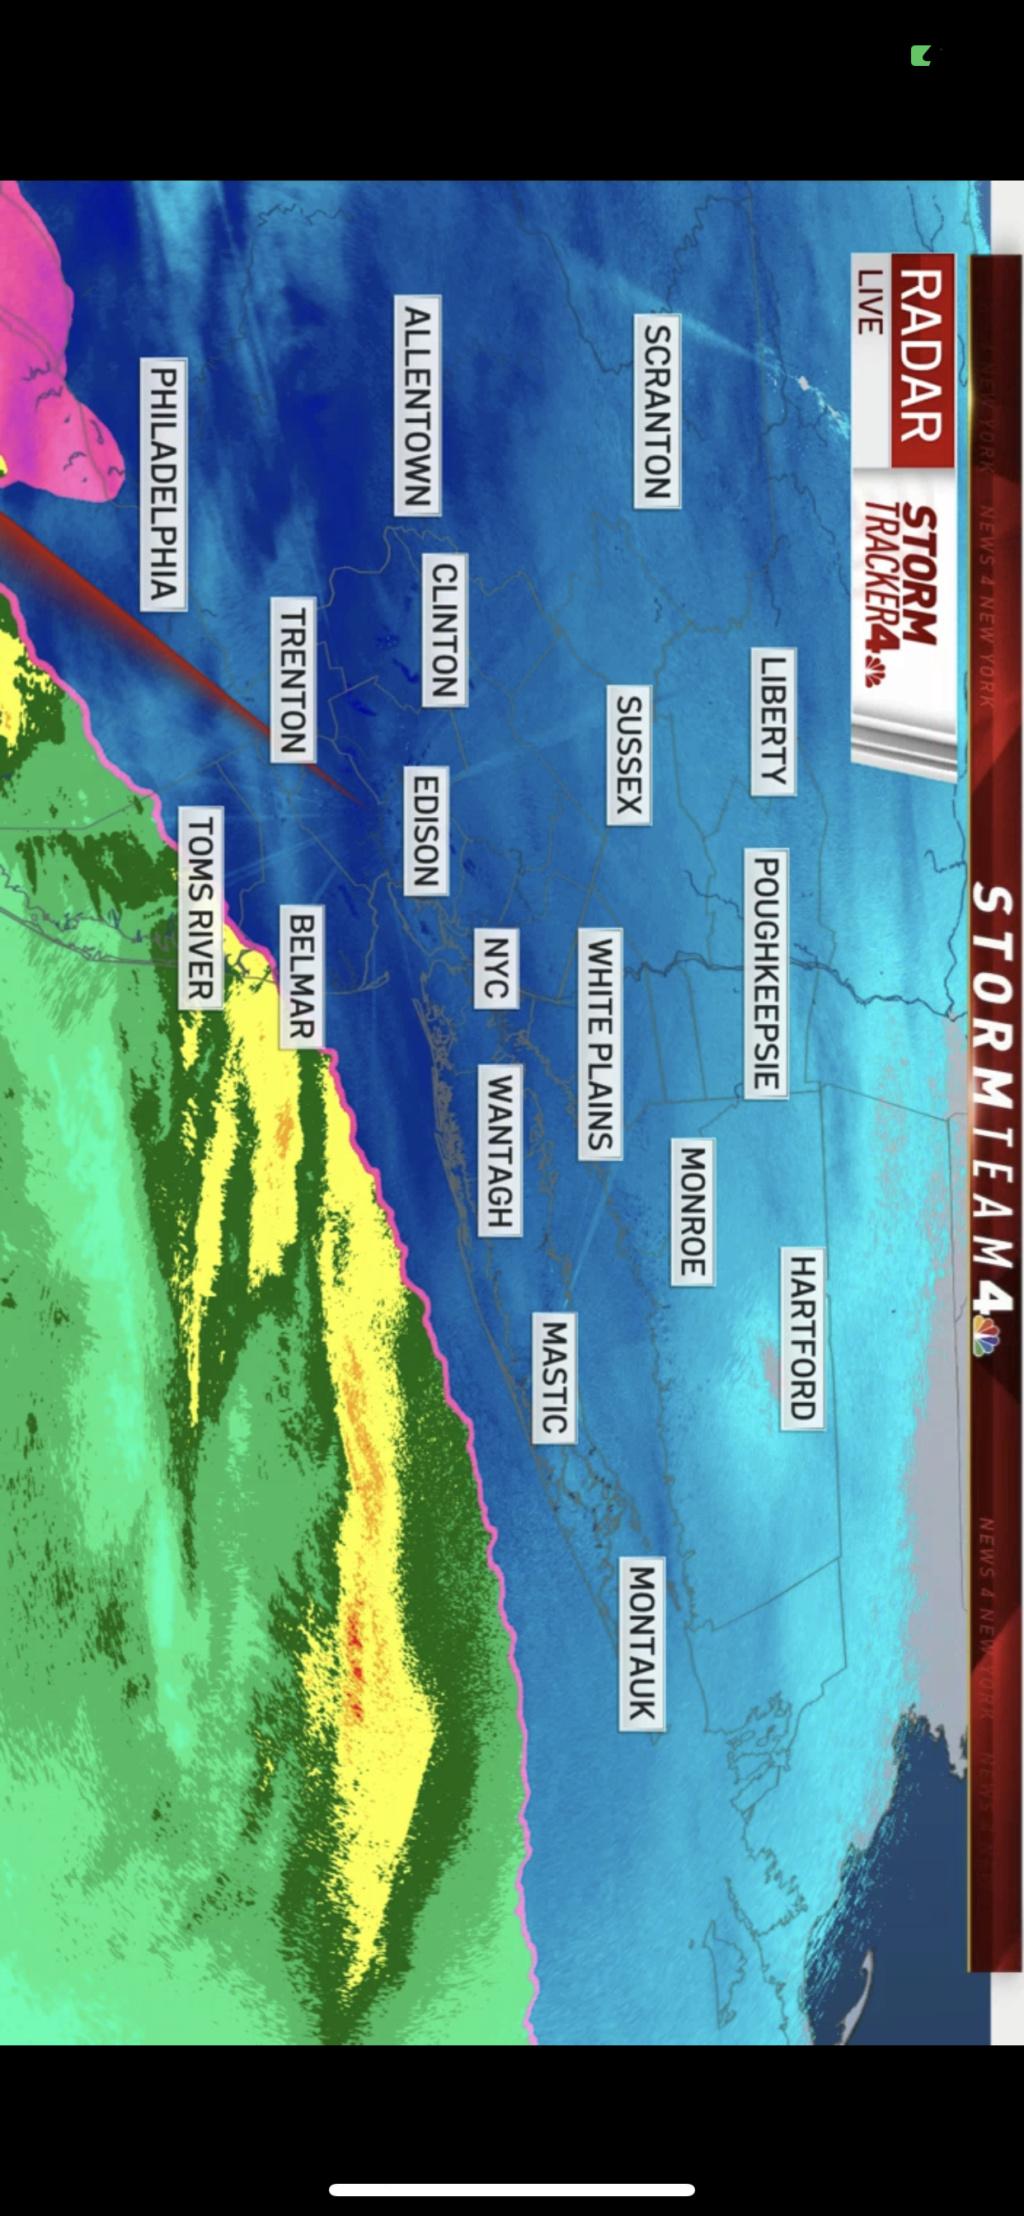 12/16-12/17 Godzilla: Final Snow Map & Obsevations - Page 17 334b3810